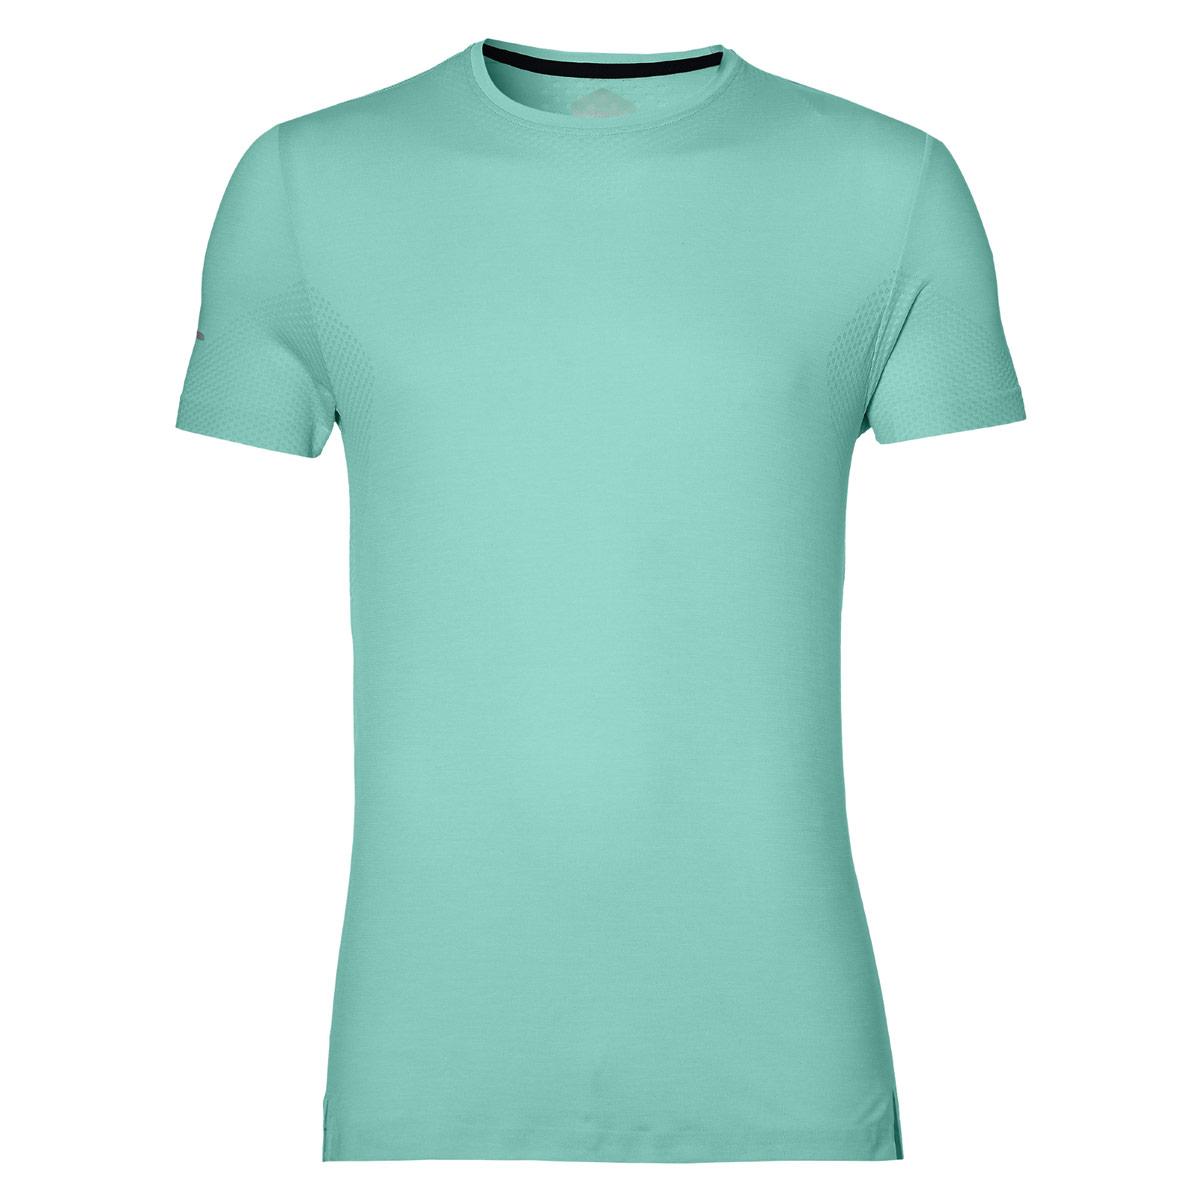 80b3524d3ce1 ASICS Seamless - Running tops for Men - Green